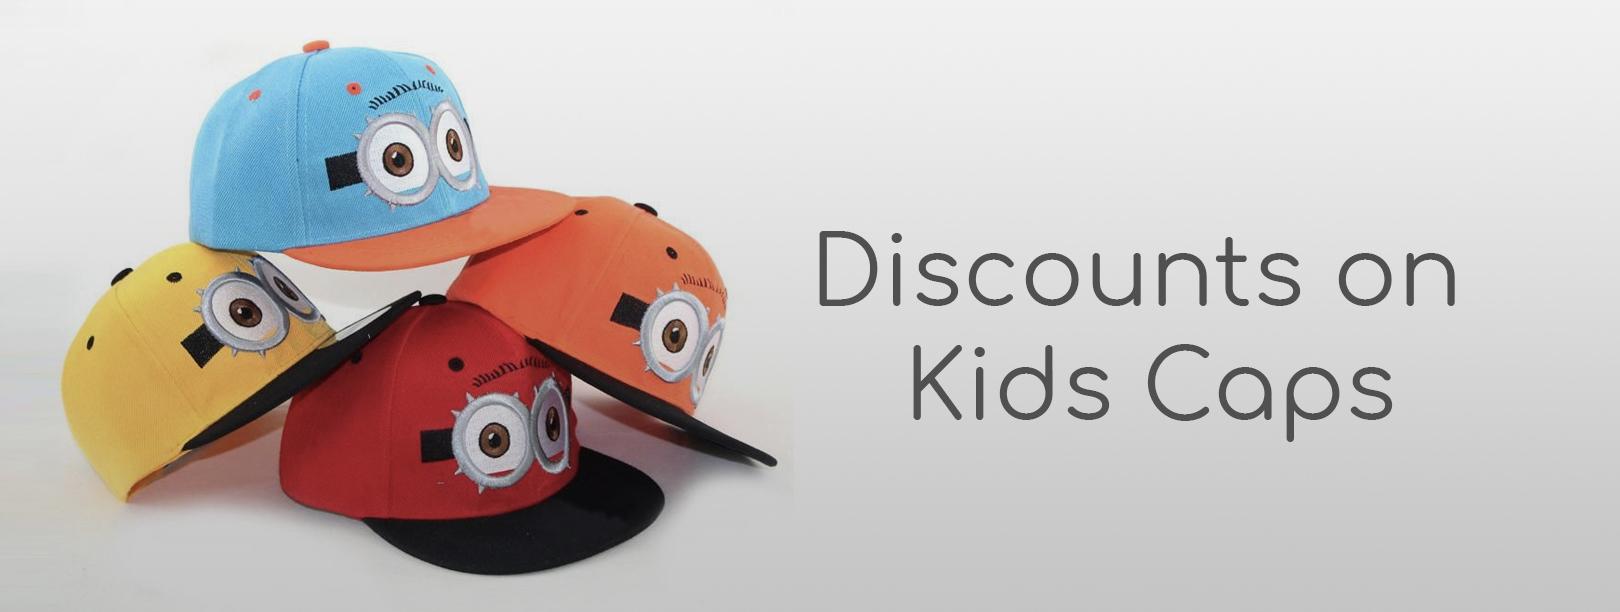 Flipkart Kids Caps